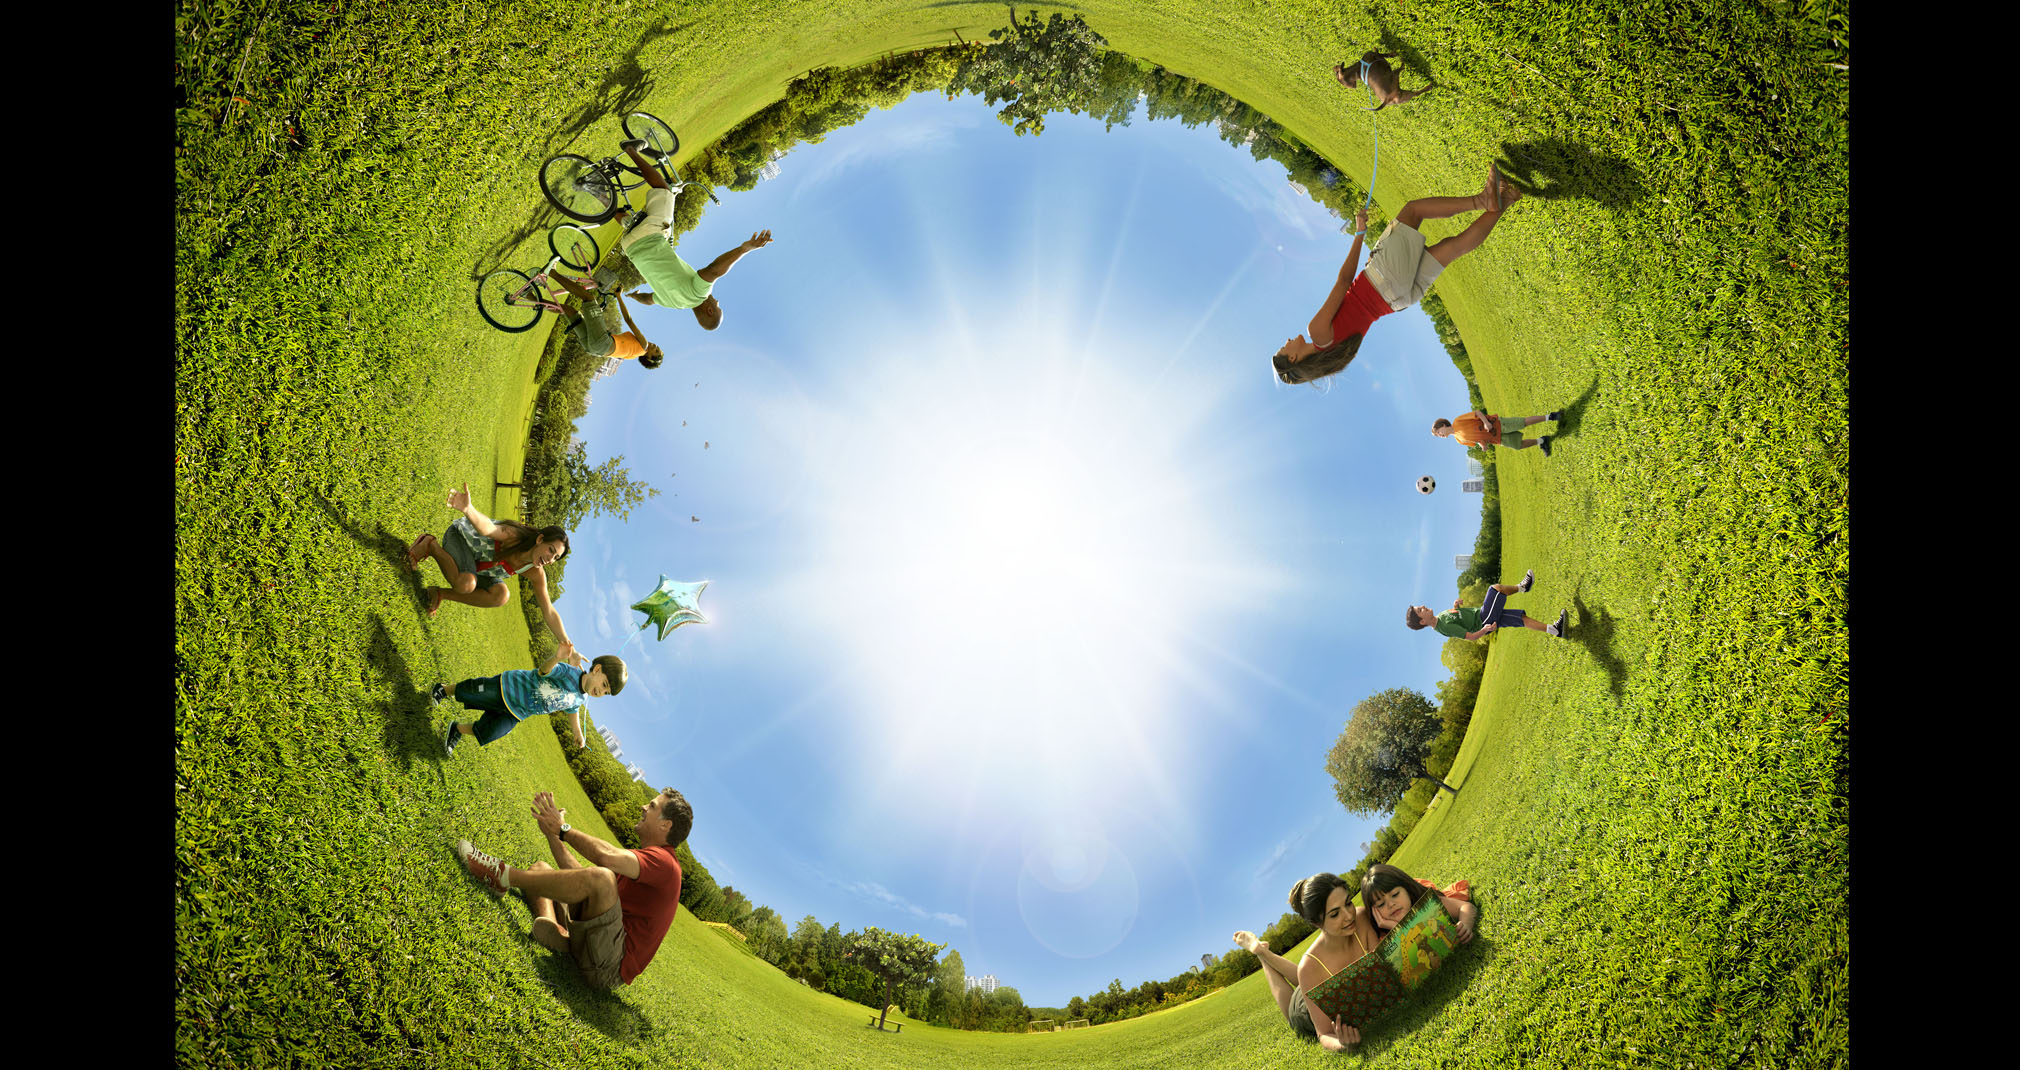 La vida es como un espejo, te sonríe si la miras sonriendo #ideas2helpu